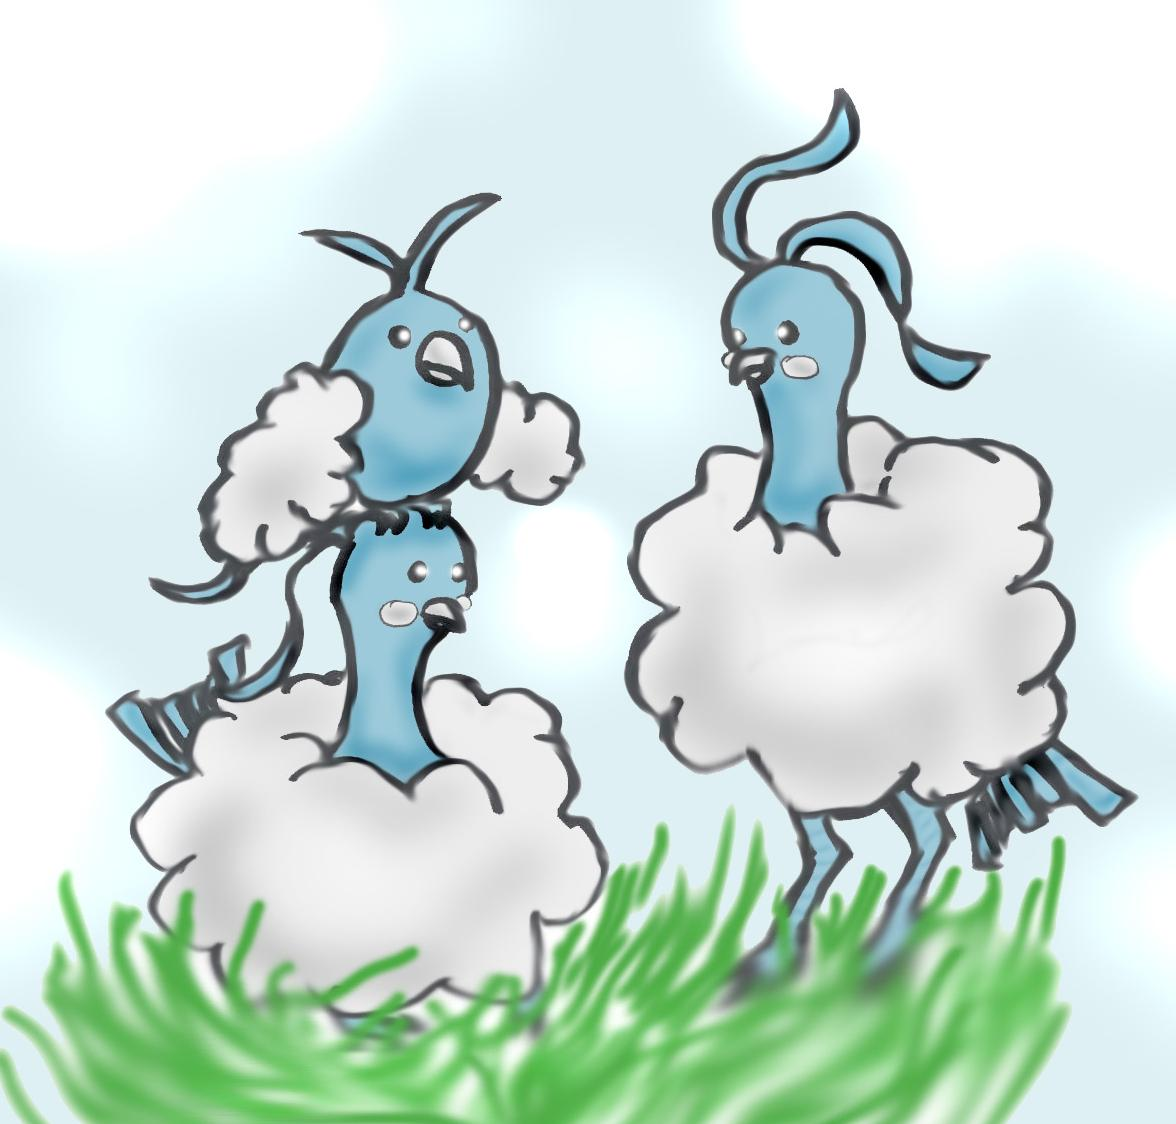 Family Flock- Altaria and Swablu by ryuuryuu